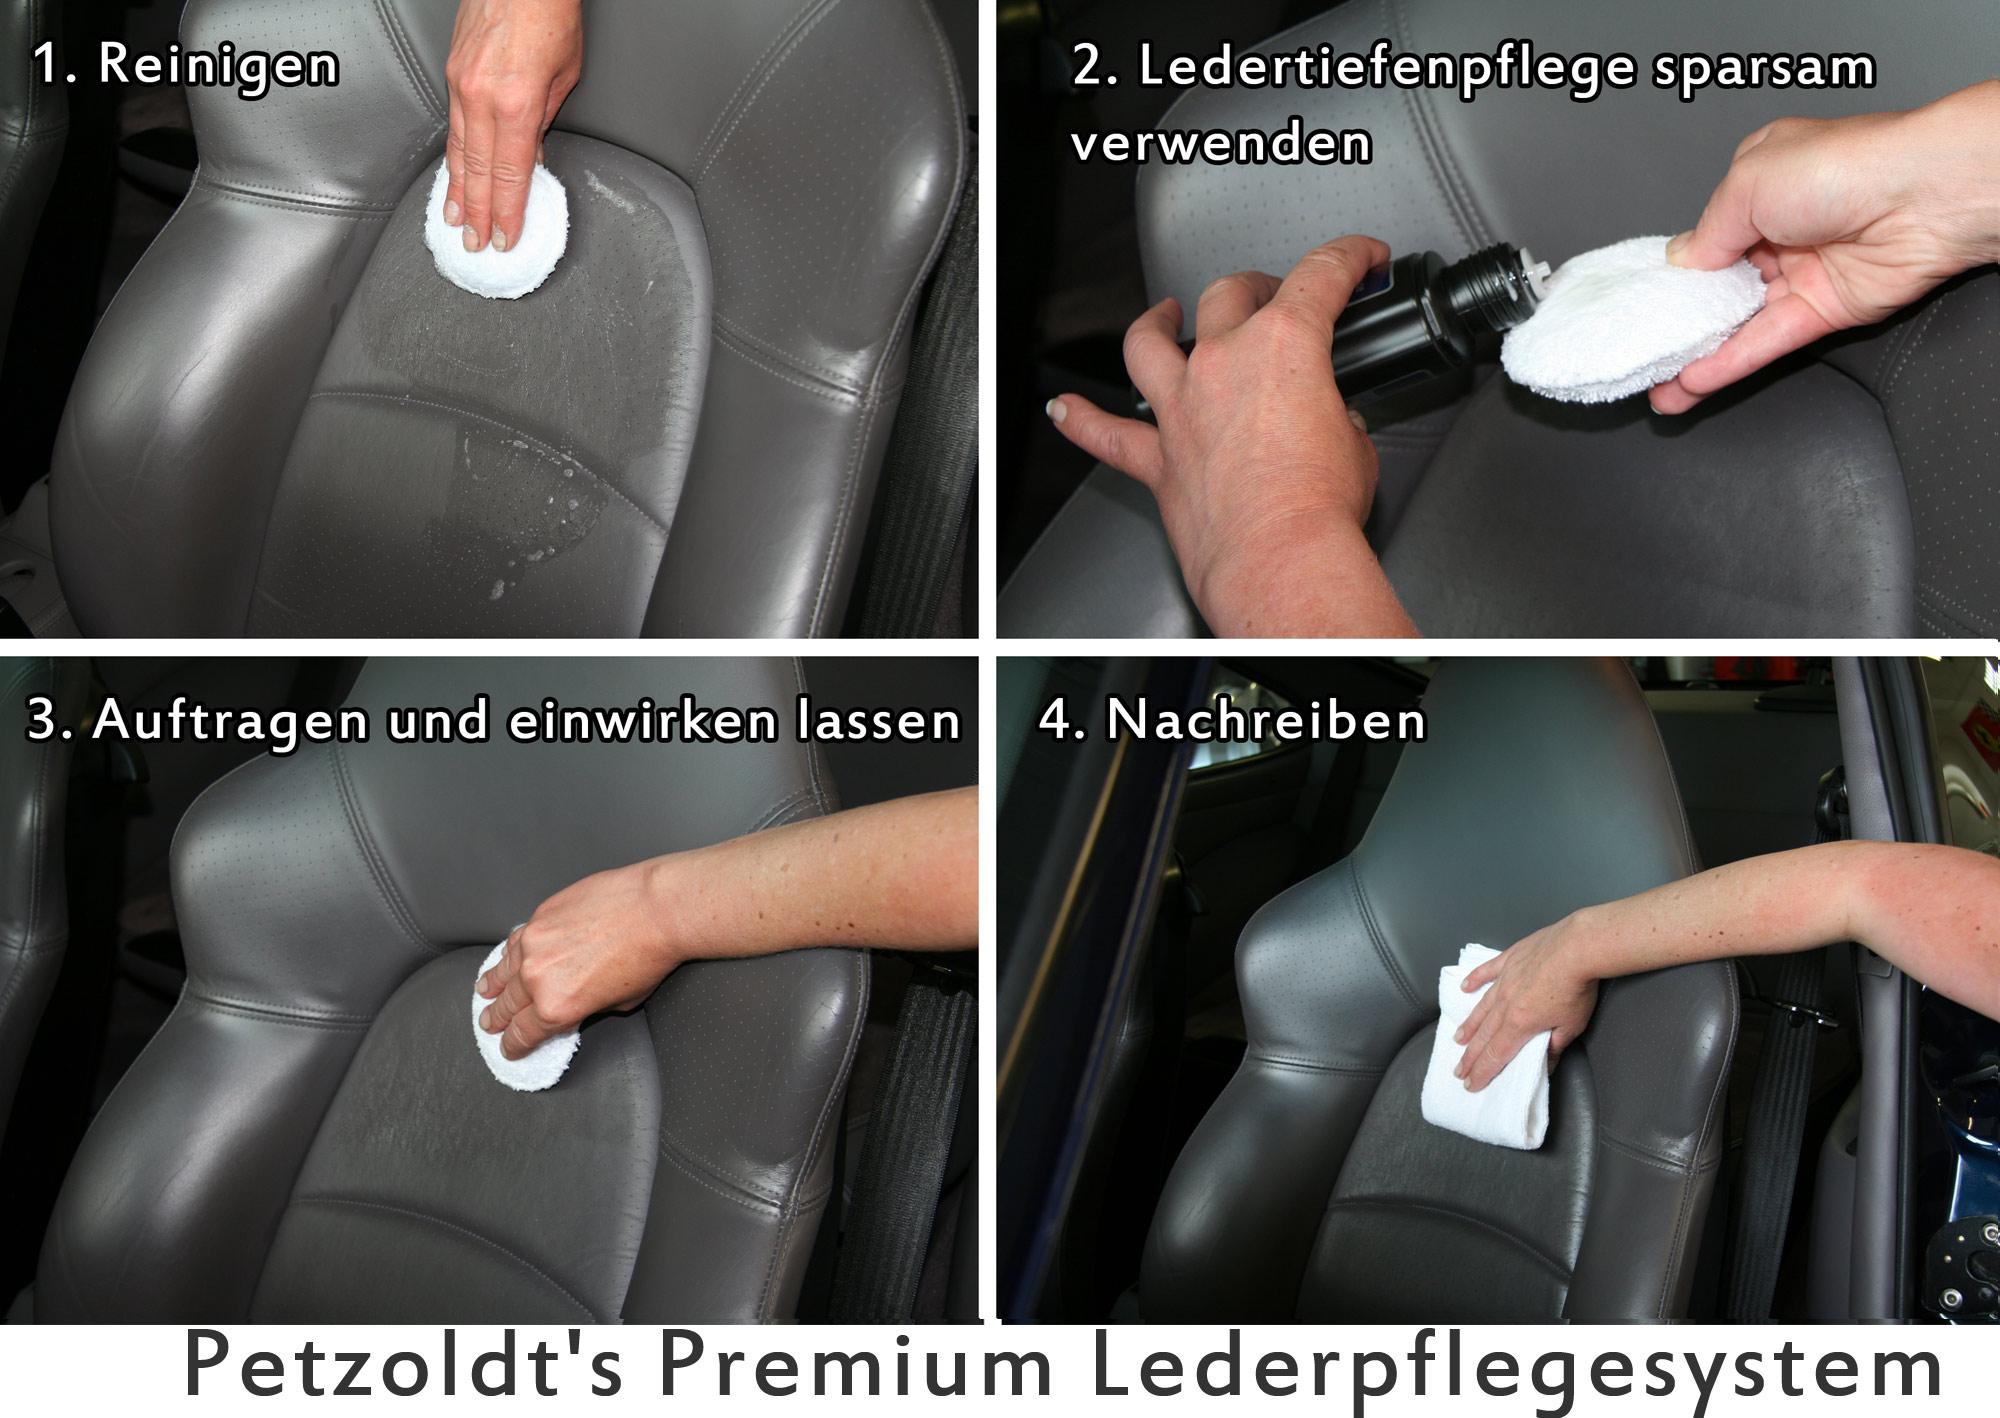 Petzoldts Premium Lederpflege-Set